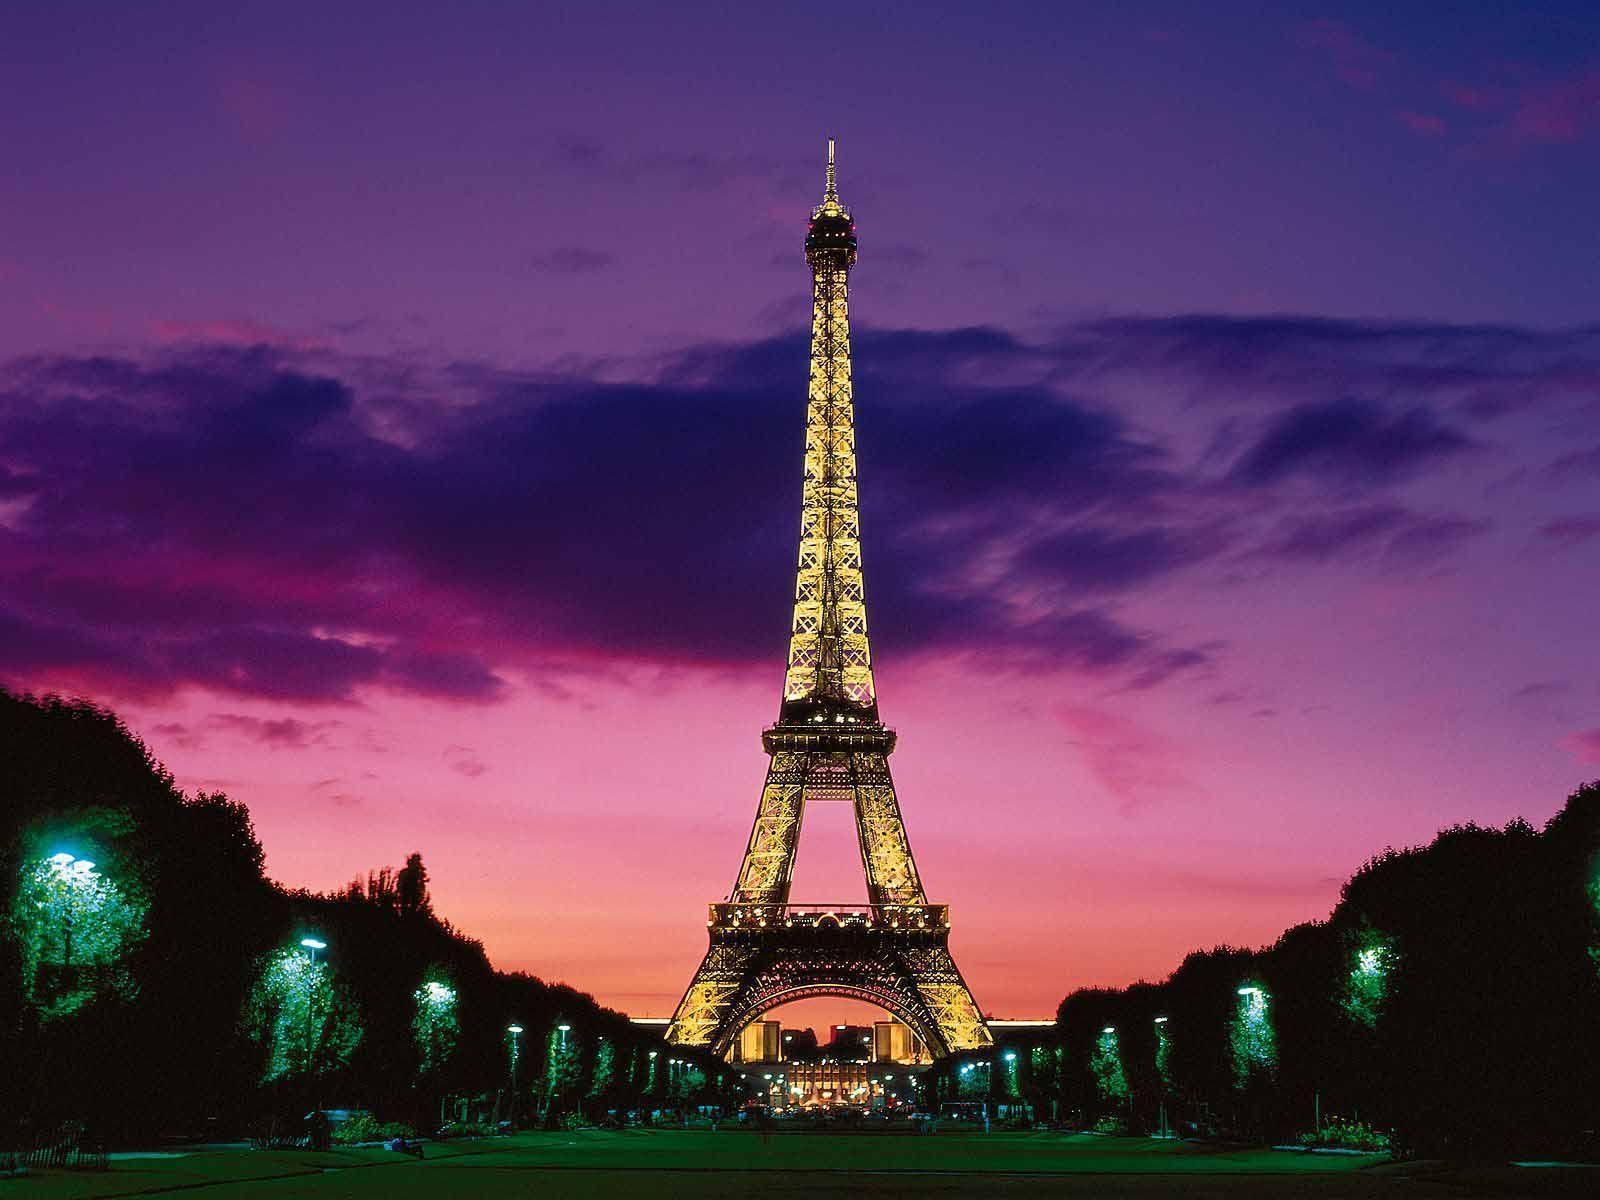 Eiffel Tower Hd Wallpapers Wallpaper Cave